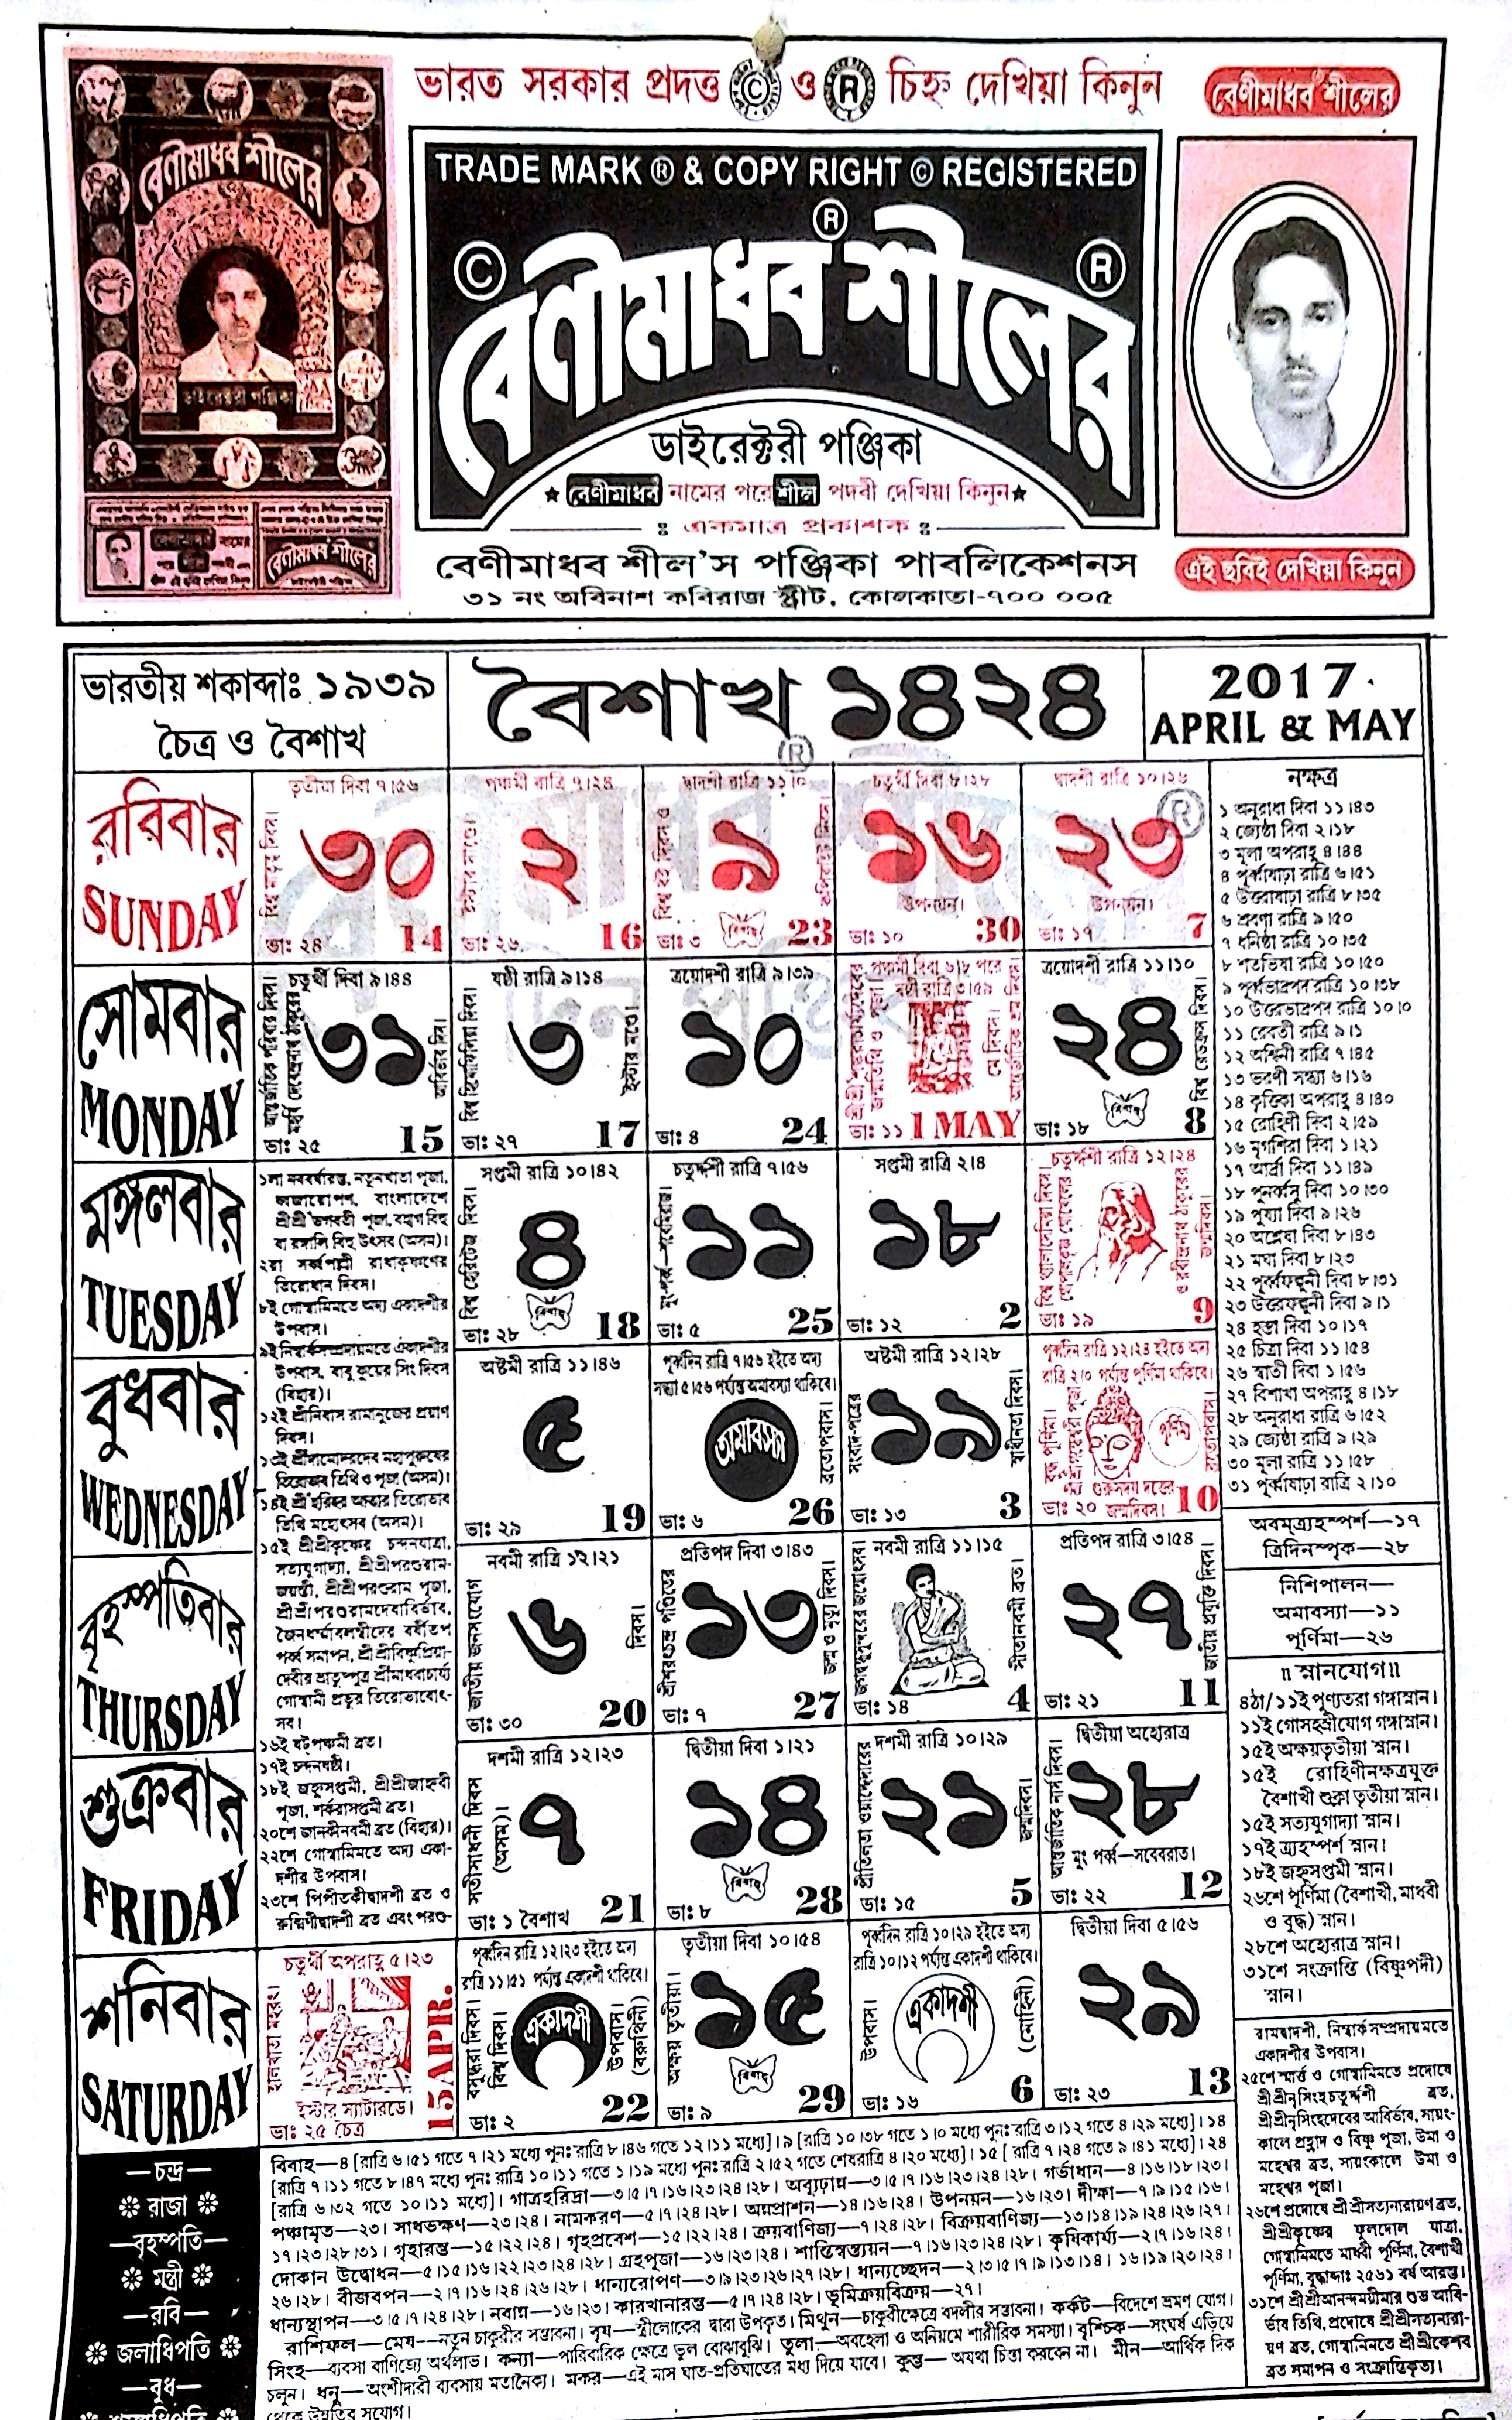 Buy Bengali Calendar 1424: Benimadhab Shil Directory Panjika 1424  Bengali Calander Pic This Year Free Pic Downlode